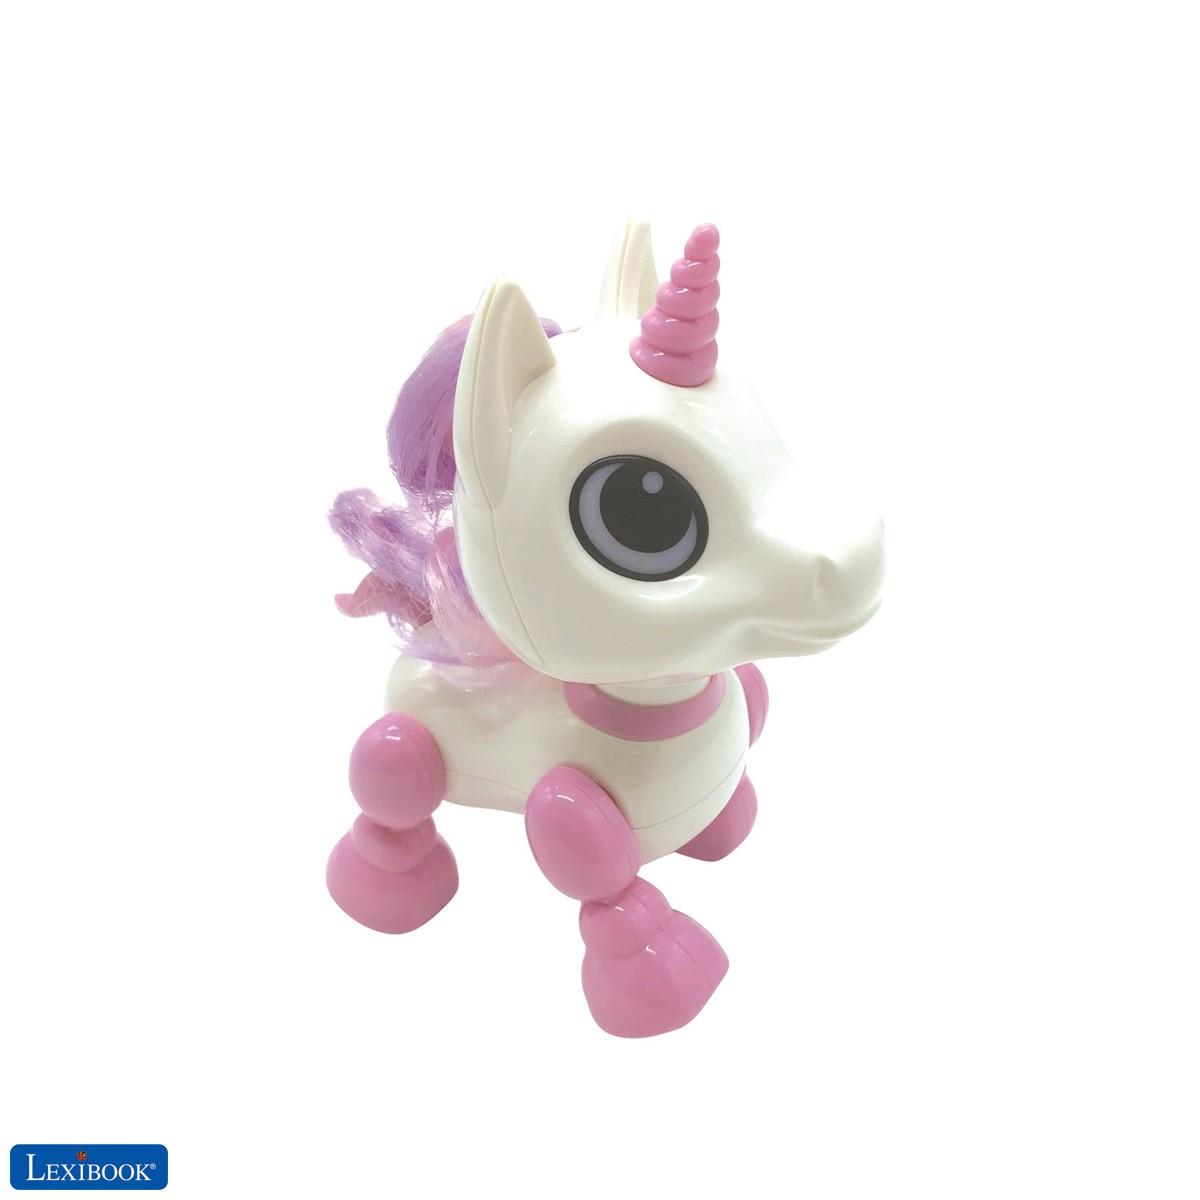 Power Unicorn Mini - My Little Robot Unicorn